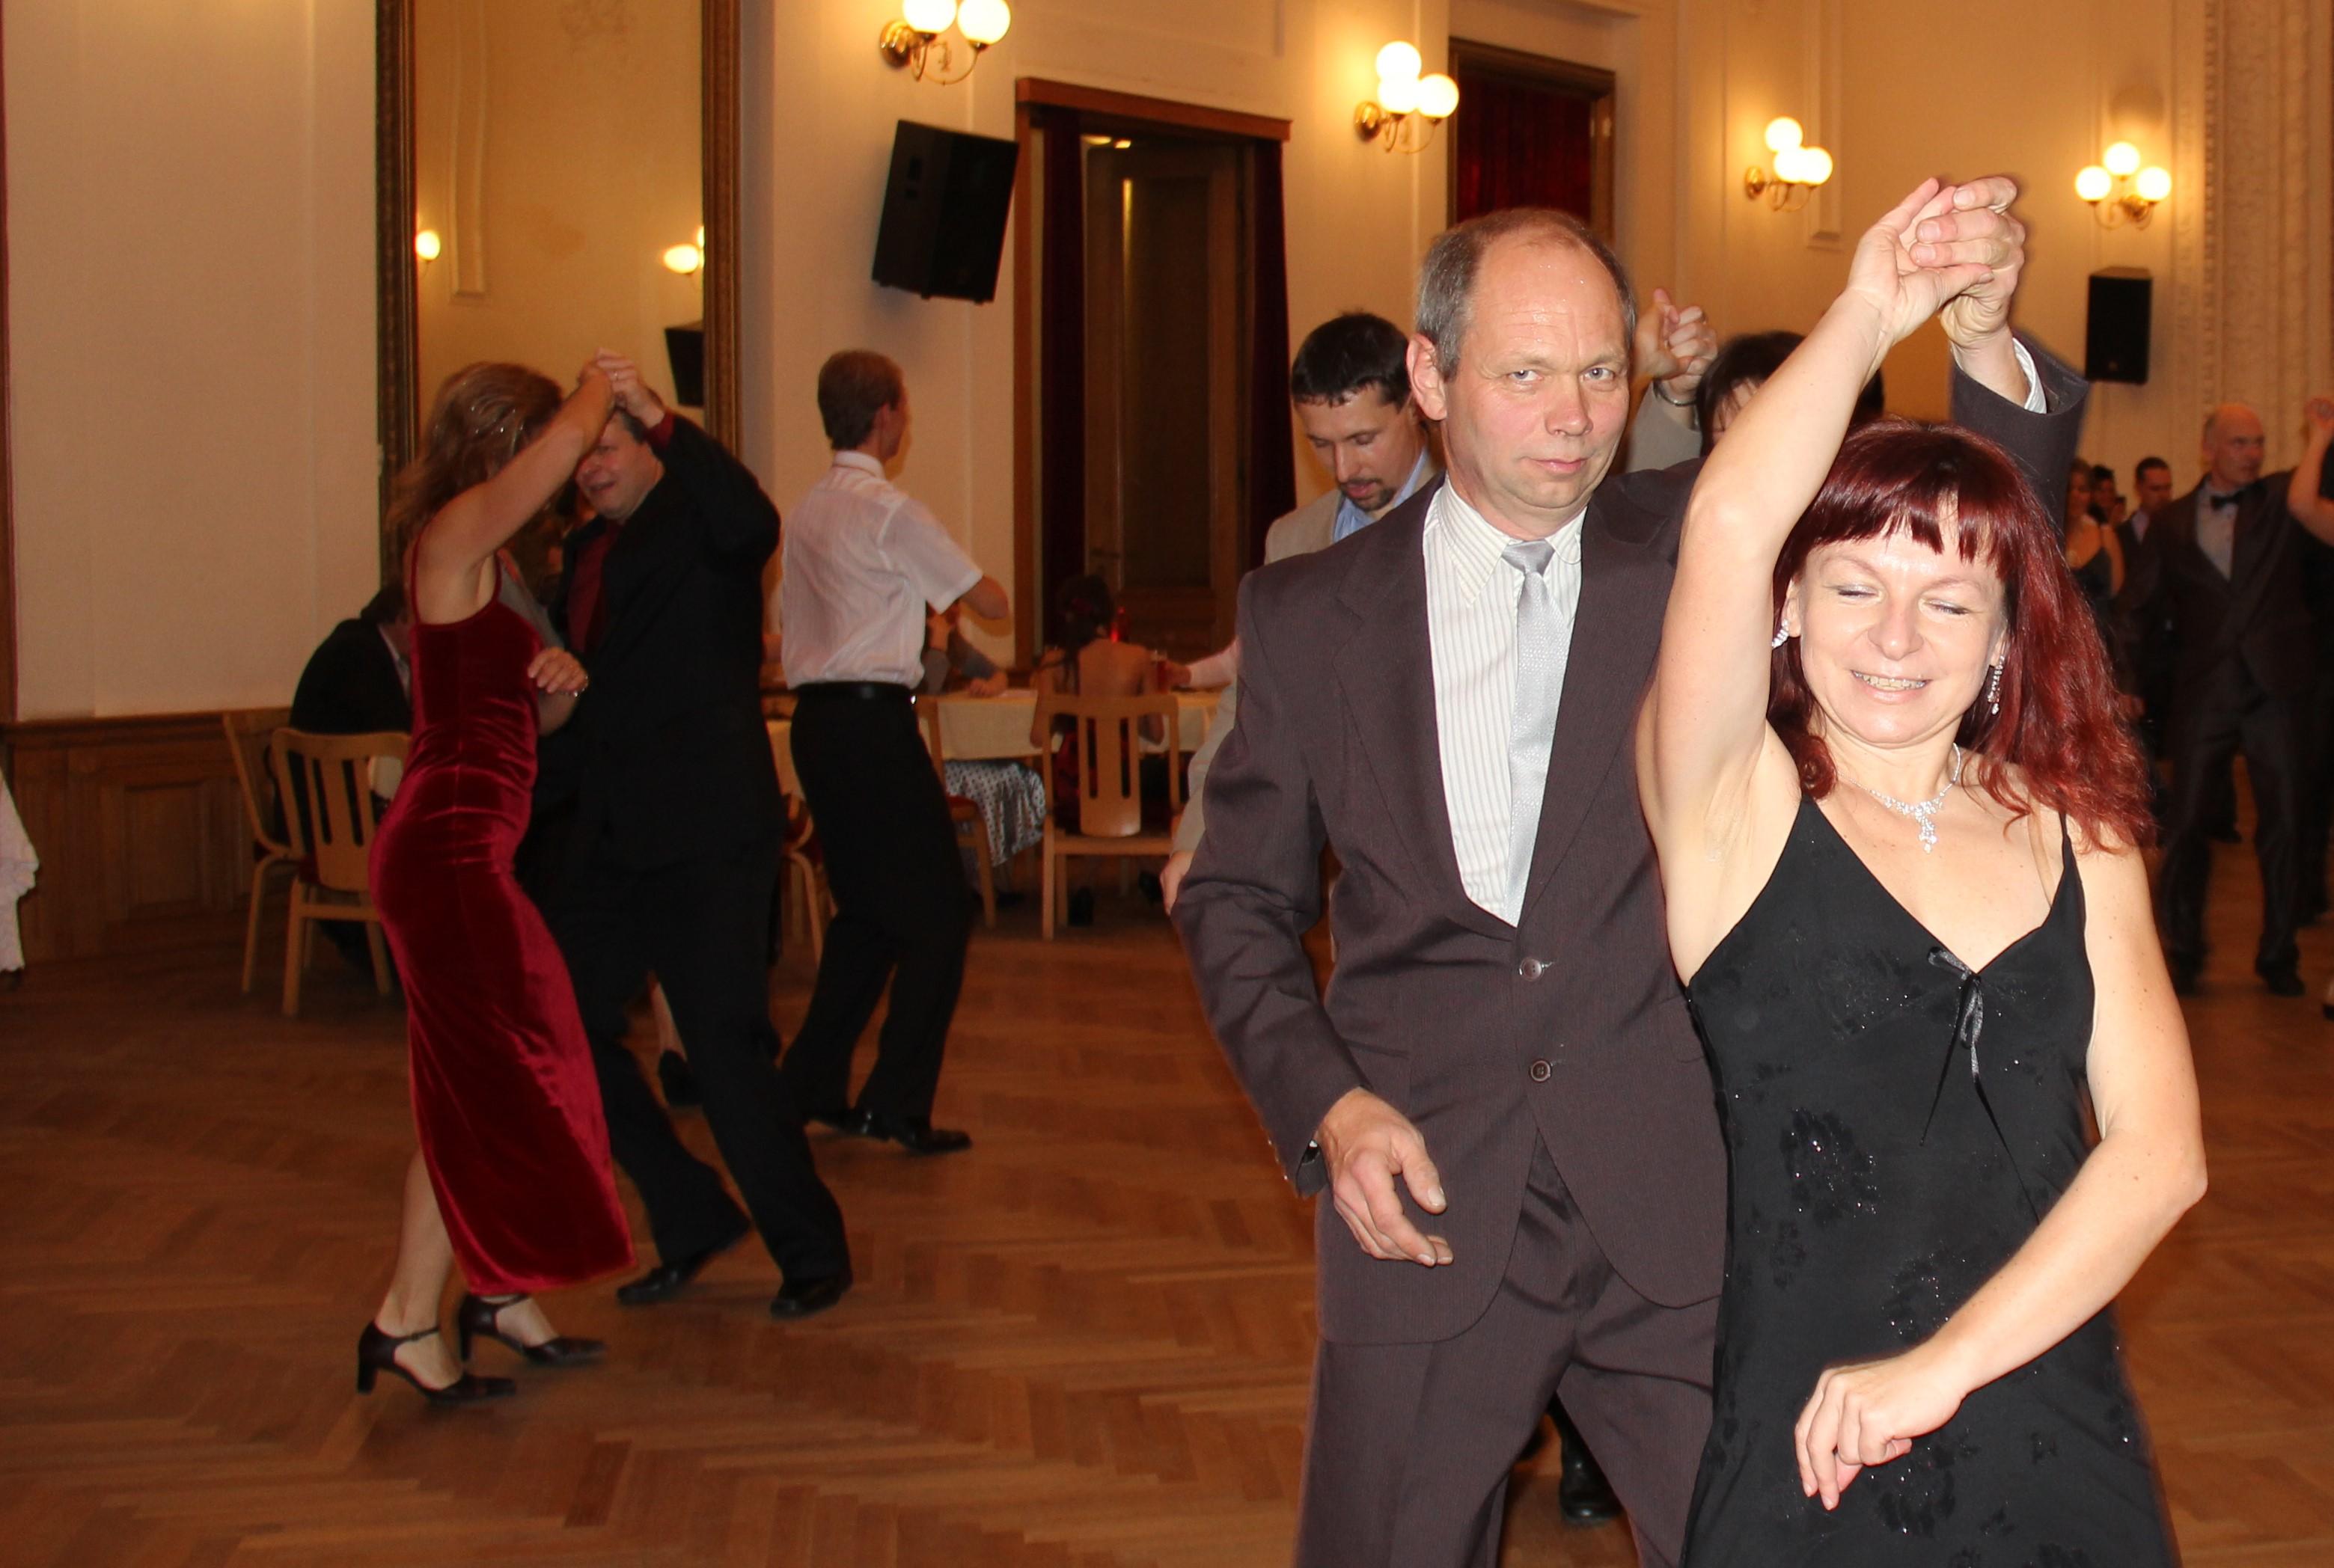 tanecni.jpg